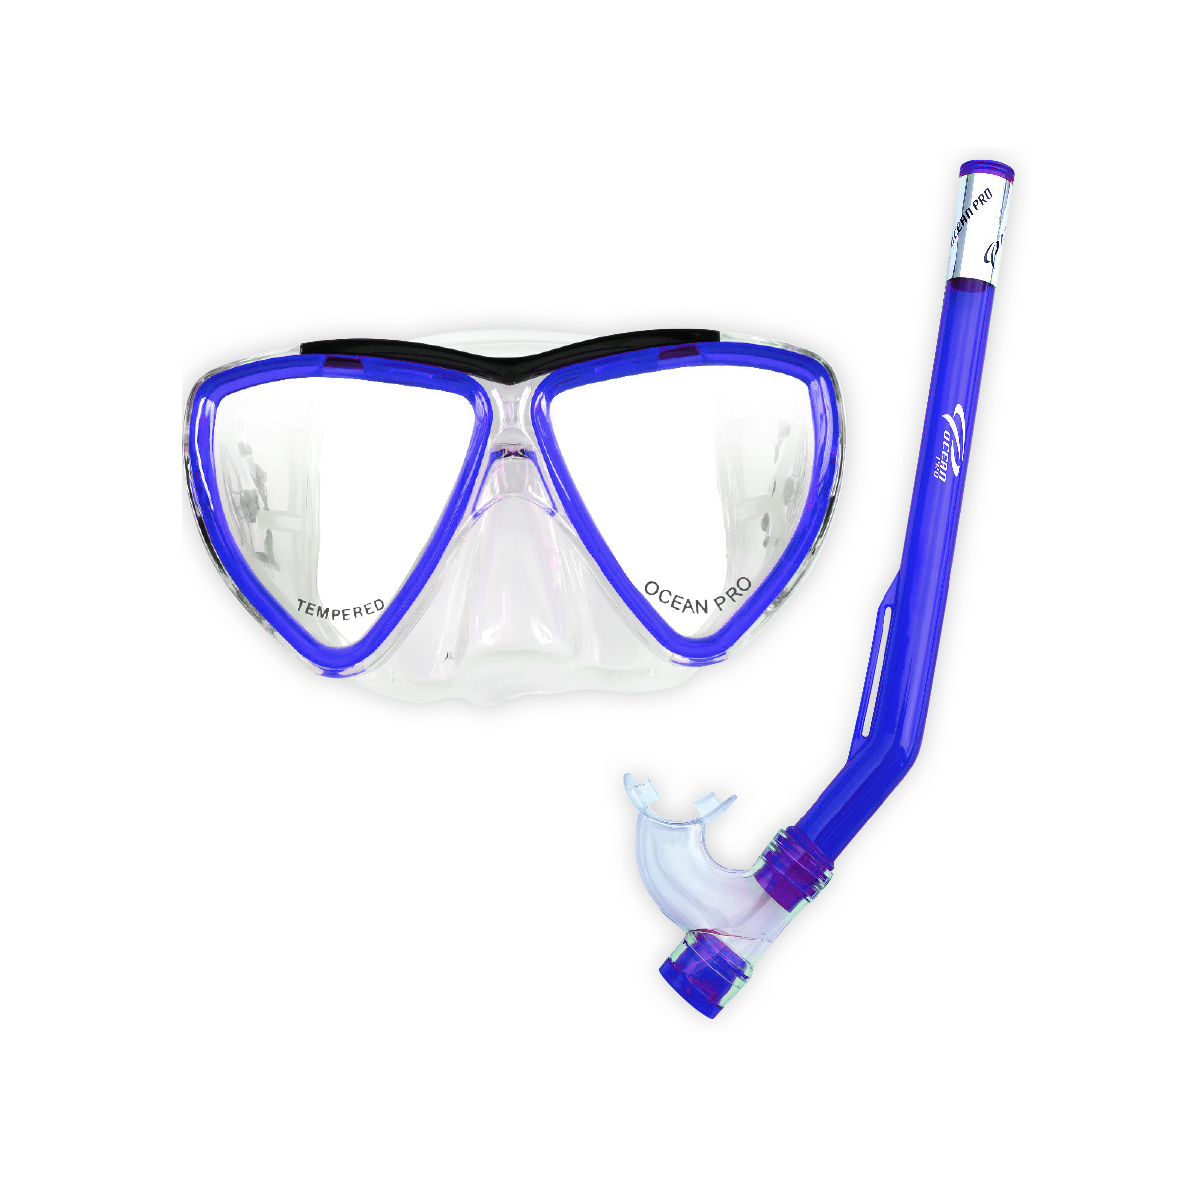 Oceanpro Tyke Junior Mask and Snorkel Combo by Oceanic